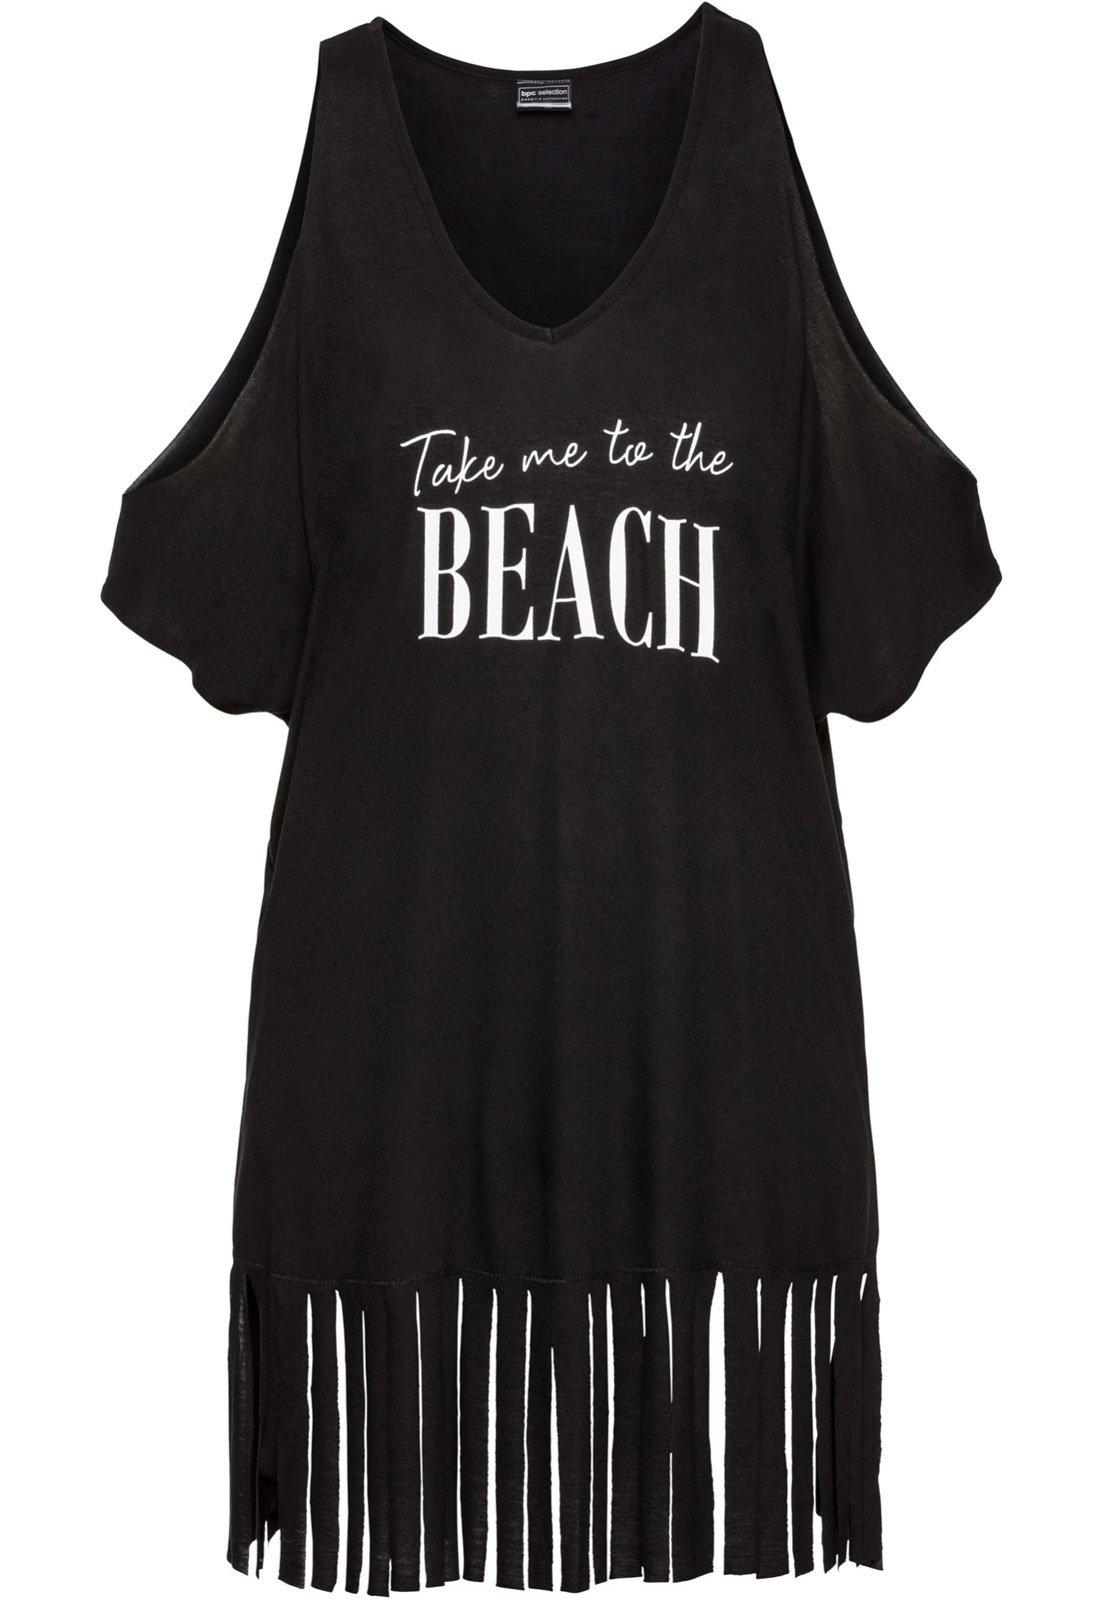 Rainlover Womens Letters Print Baggy Swimwear Bikini Cover-ups Beach Dress (BB-Black) by Rainlover (Image #3)